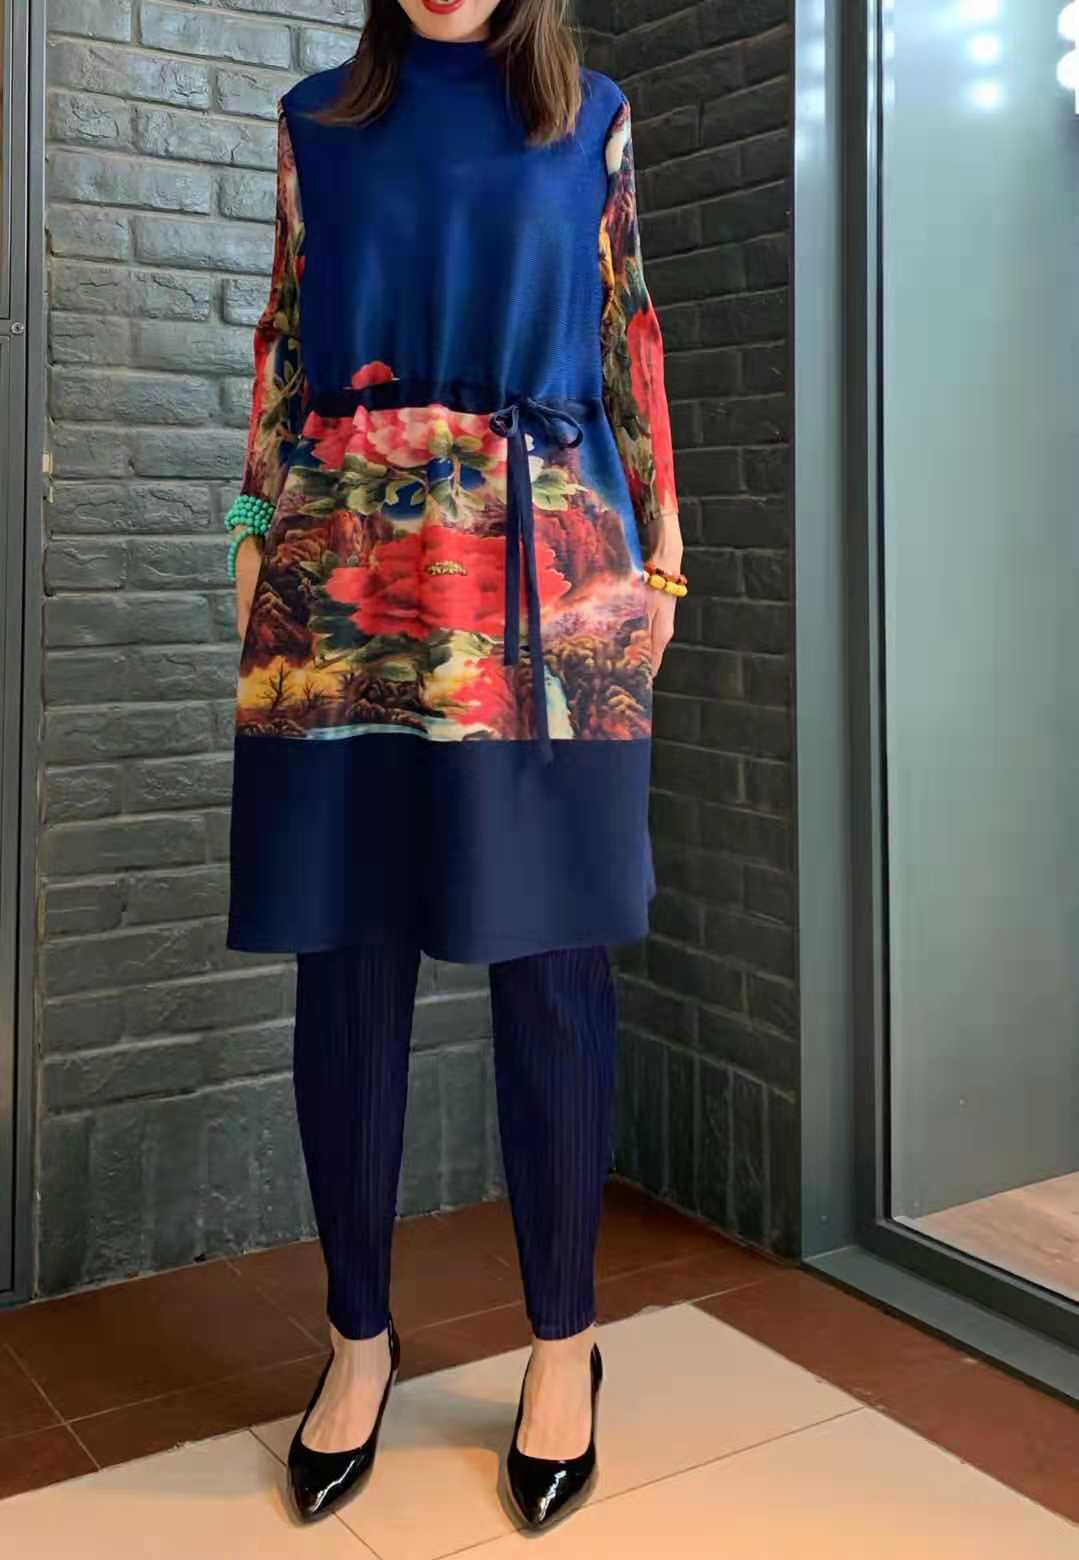 Miyake Pleats New Thin Noble Printed Lace-up Dress dress women elegant dress plus size dresses girls vestido women clothes